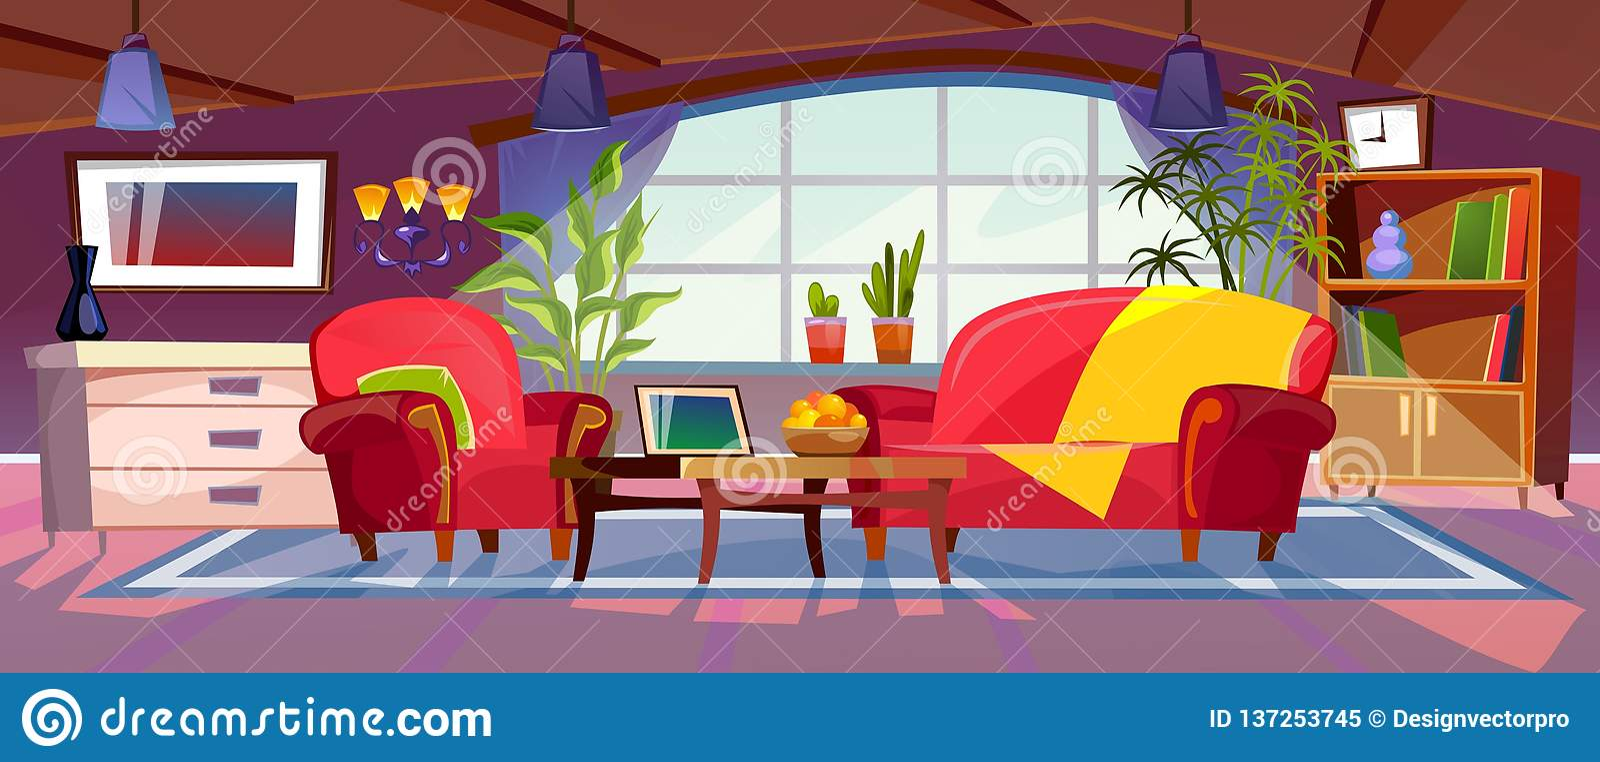 Cartoon Living Room Interior View Empty Colorful Room